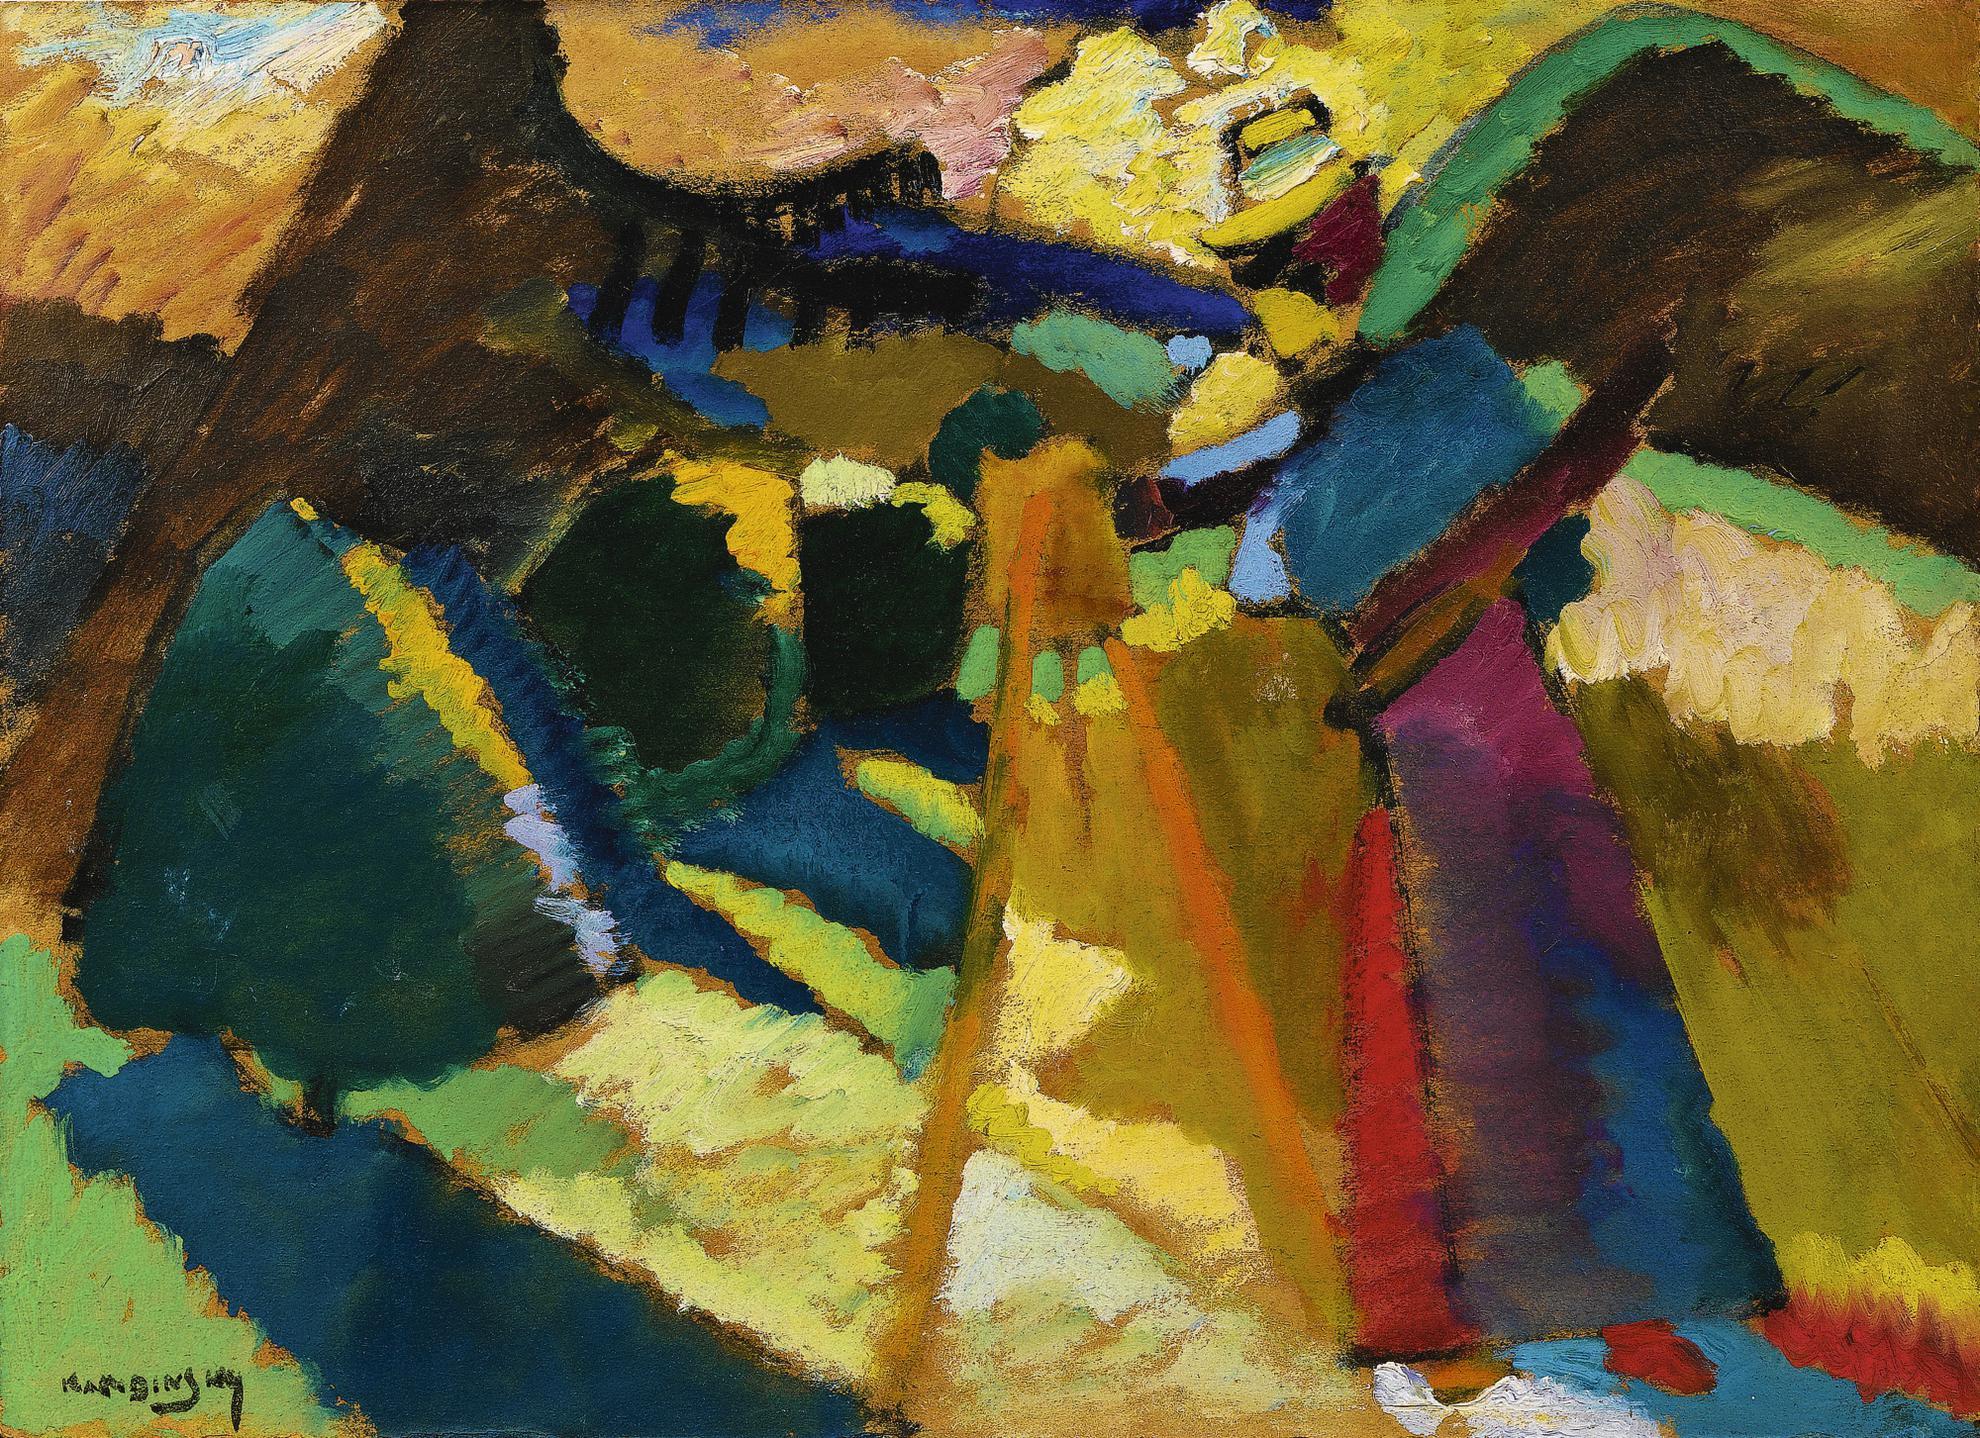 Wassily Kandinsky-Gabriele Munter Im Freien Vor Der Staffelei (Gabriele Munter Painting Outdoors In Front Of An Easel)-1910